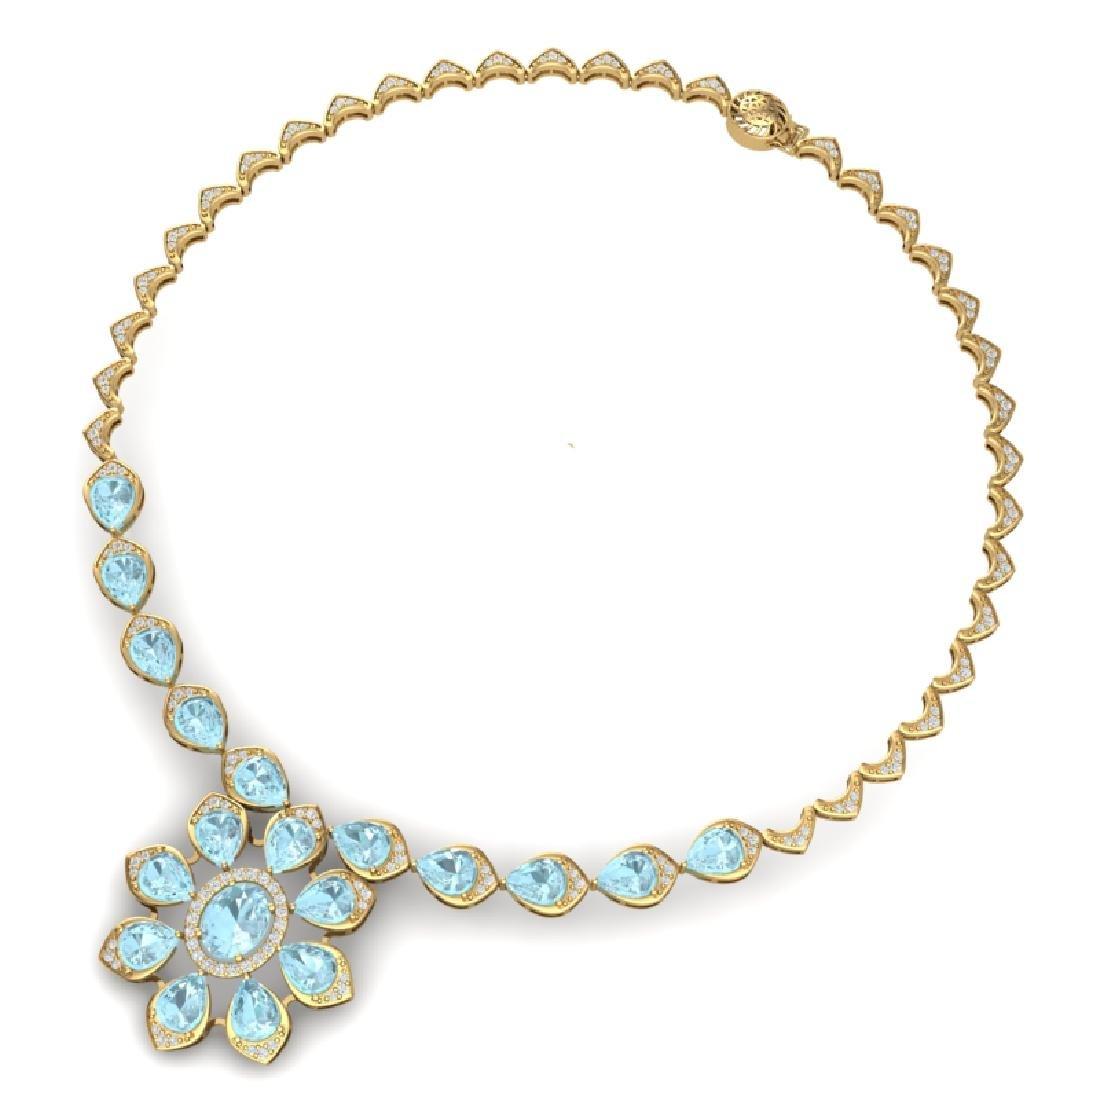 29.34 CTW Royalty Sky Topaz & VS Diamond Necklace 18K - 3